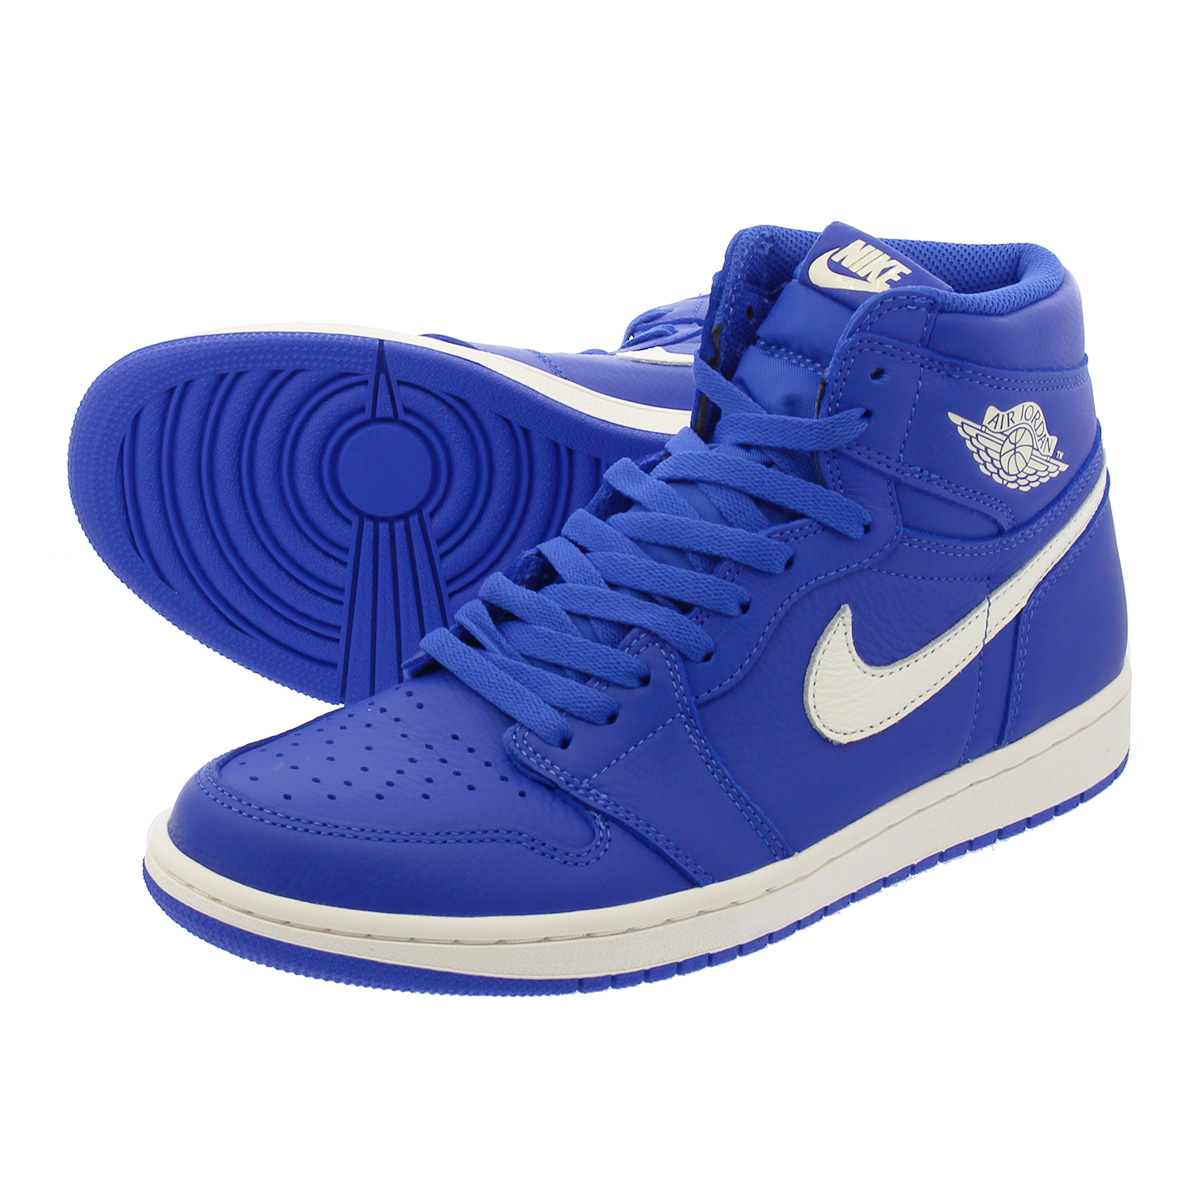 f8f3e324d2102e NIKE AIR JORDAN 1 RETRO HIGH OG Nike Air Jordan 1 nostalgic high OG HYPER  ROYAL SAIL 555